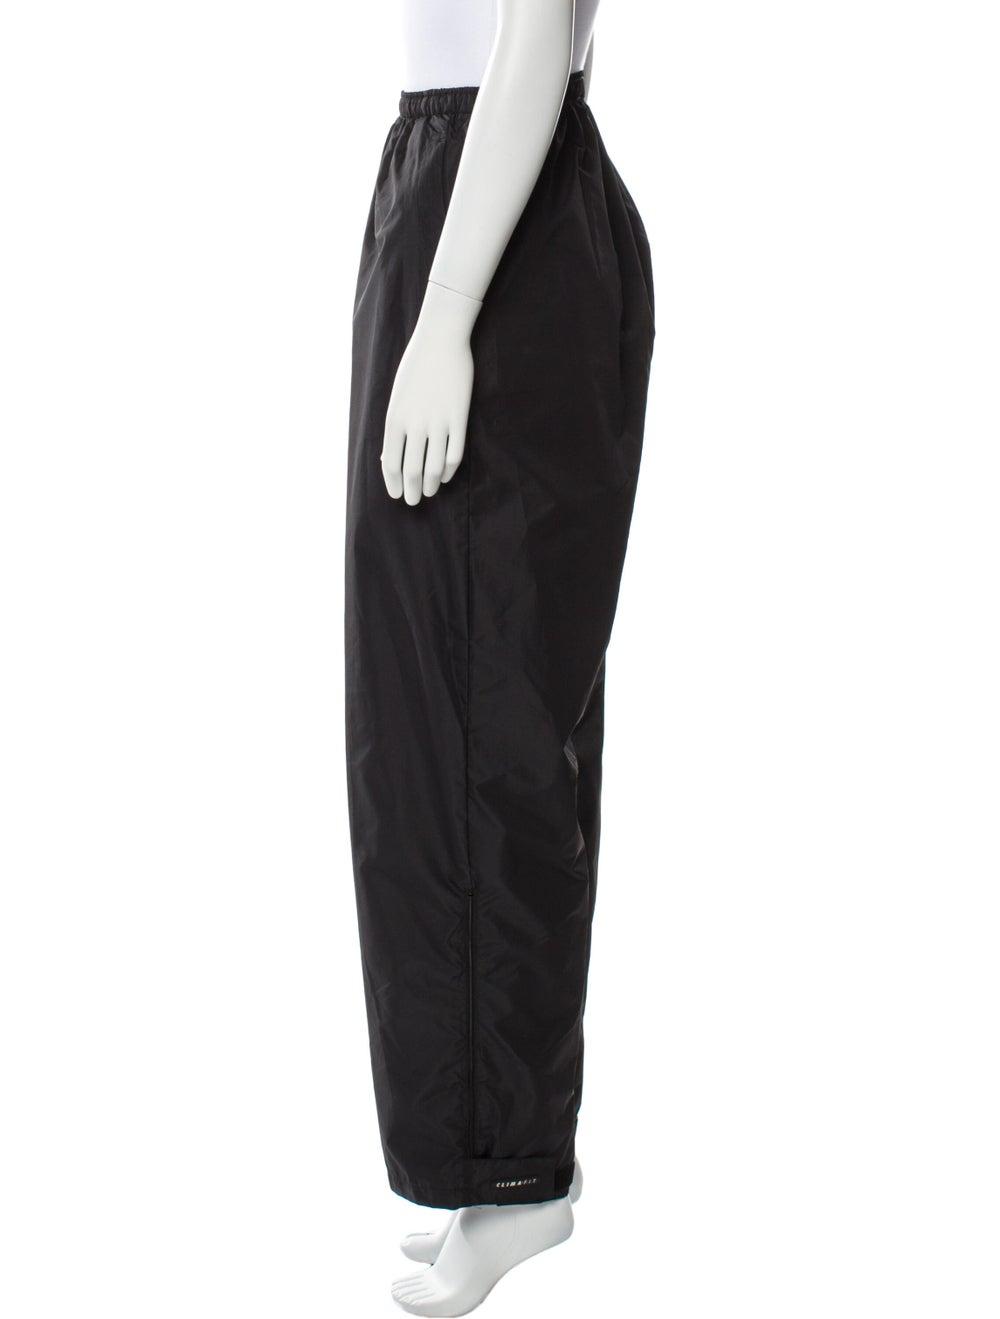 Nike Wide Leg Pants Black - image 2